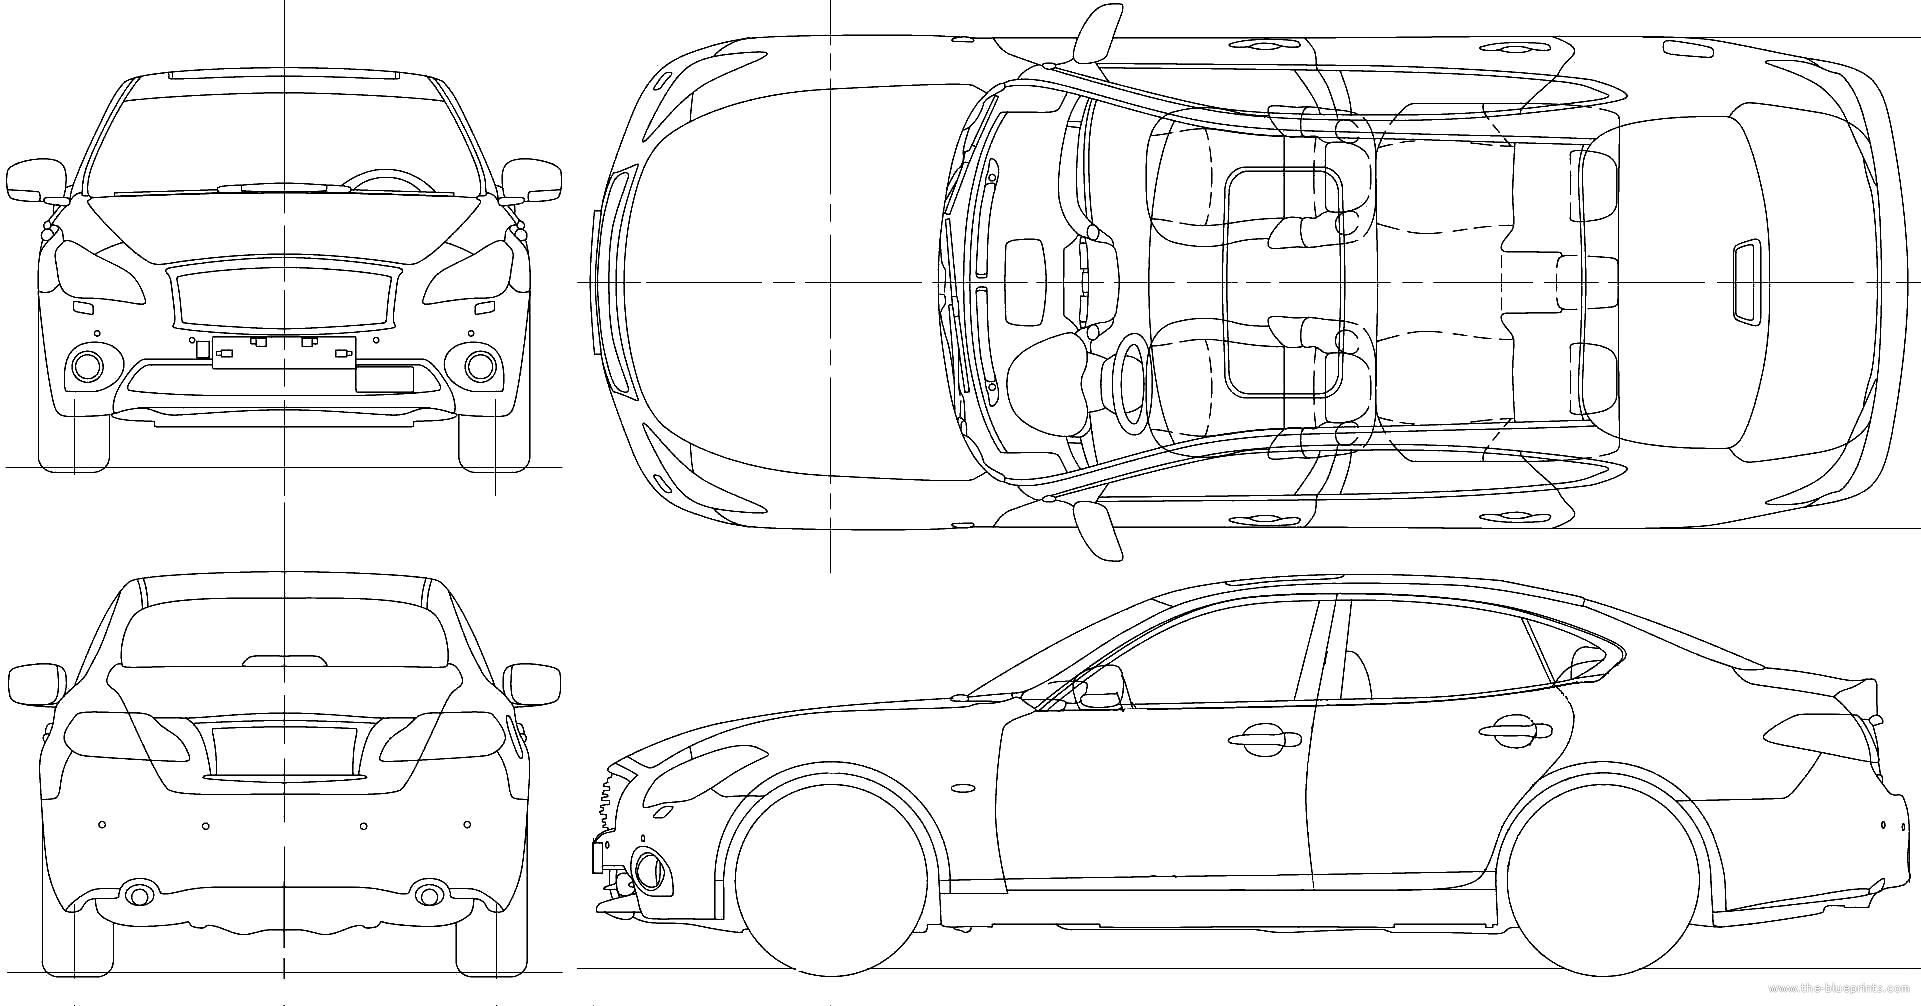 Blueprints > Cars > Infiniti > Infiniti M45 (2010)